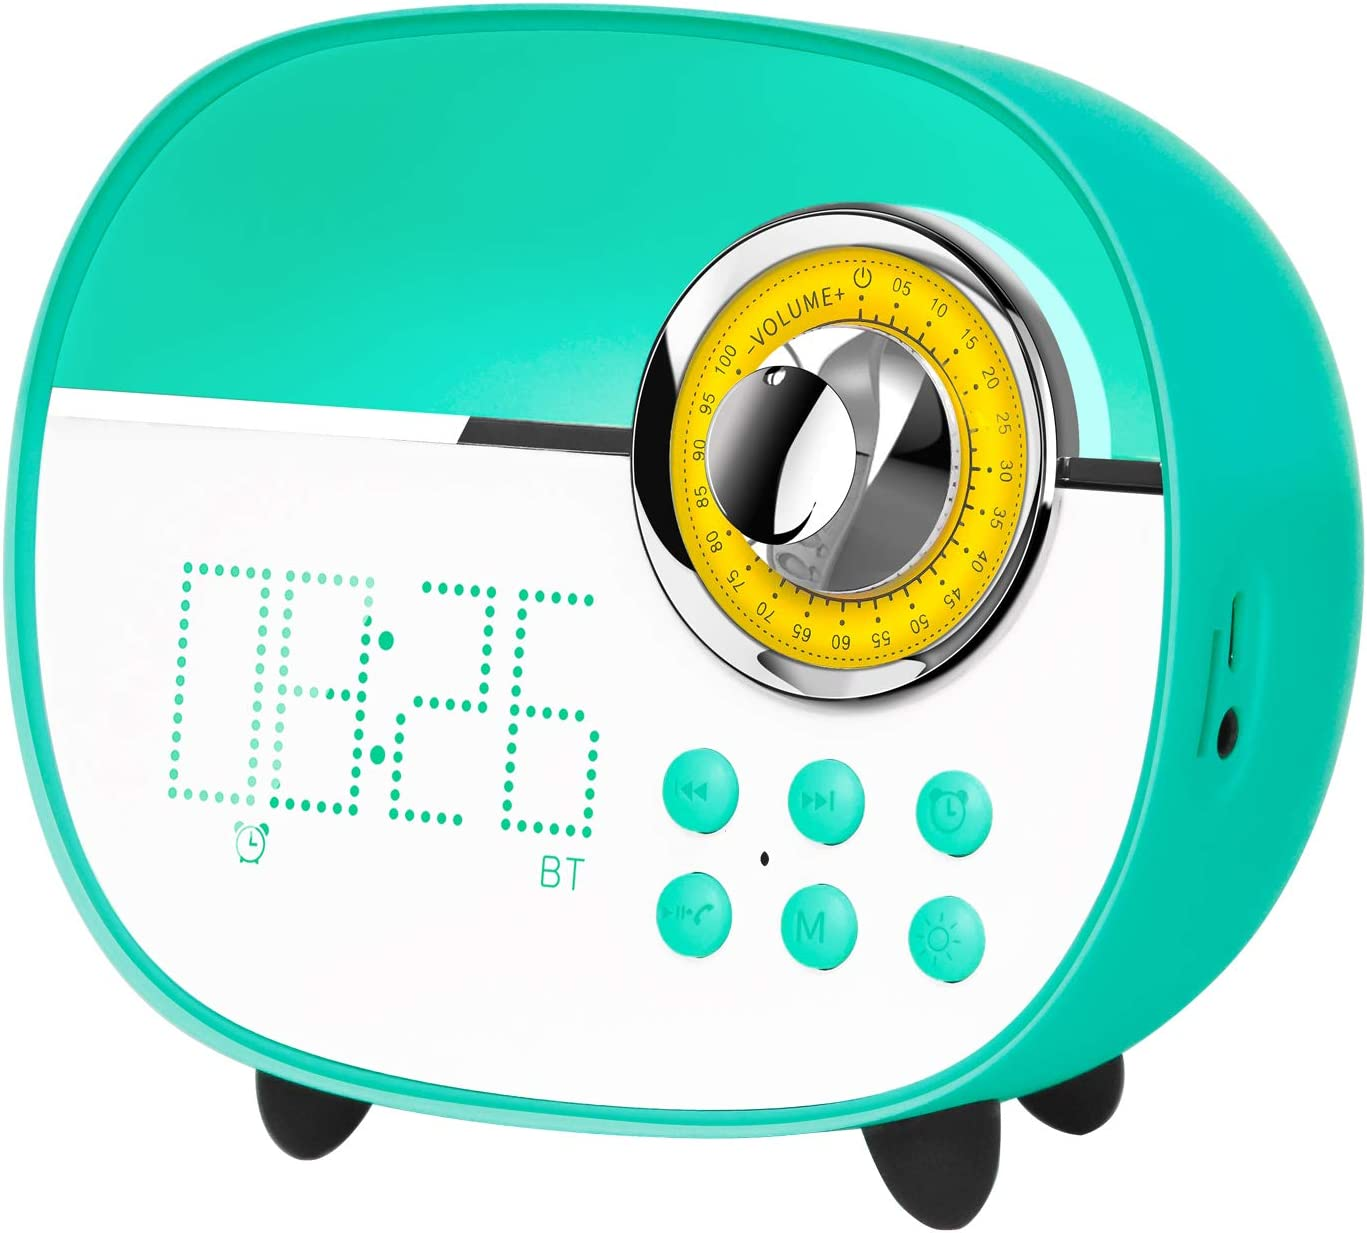 Handsfree Call Green LEMEGA CR1+ Portable Alarm Clocks Radios with Wireless Bluetooth Speaker Built-in Battery Colorful LED Lighting